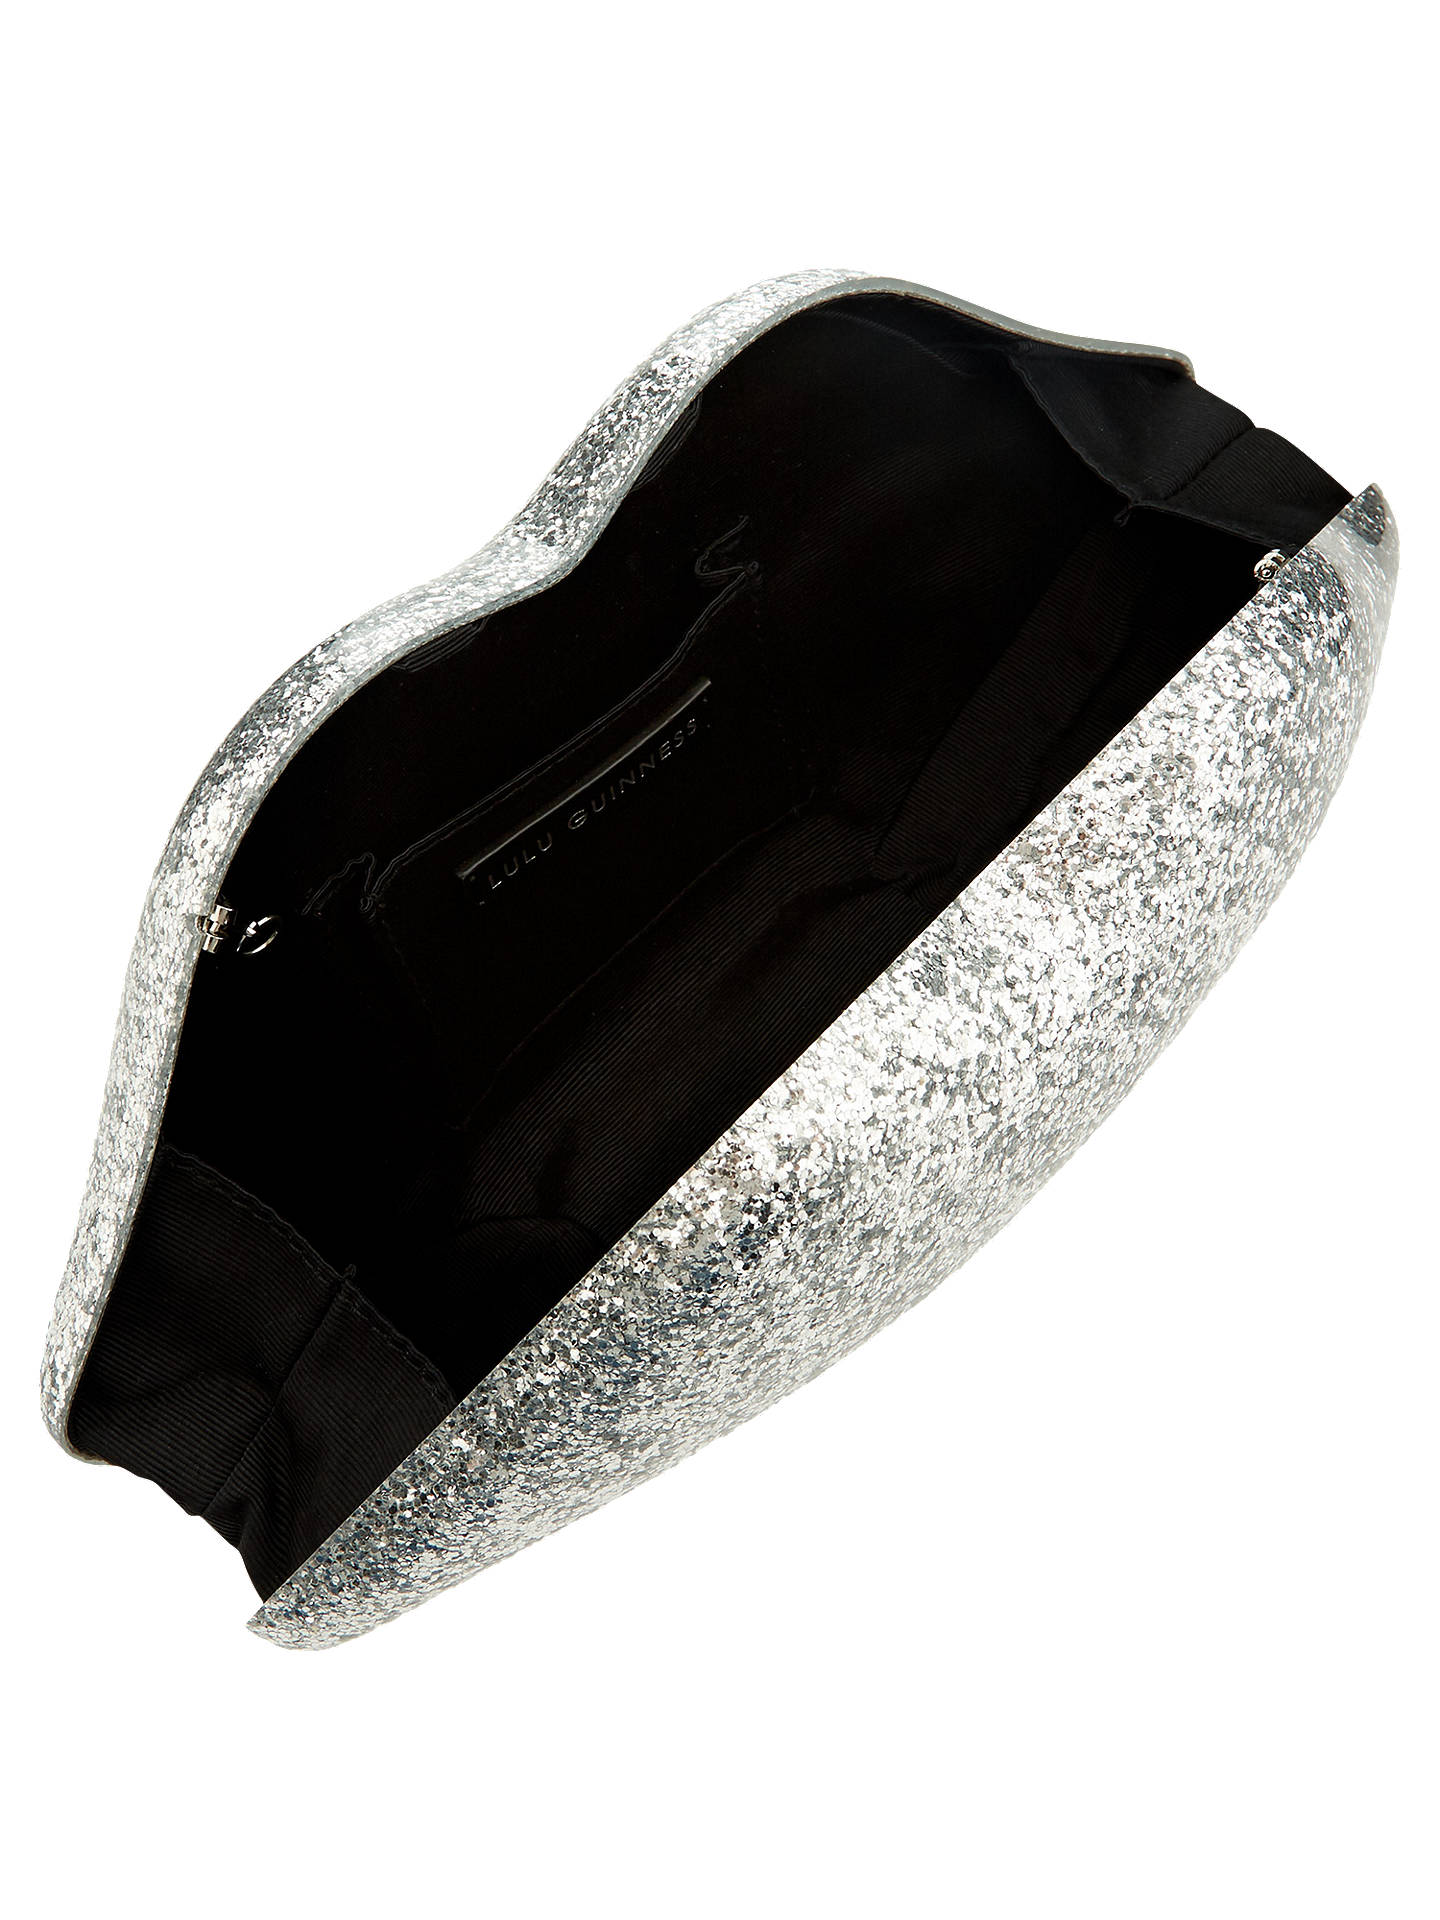 f516401001db6 ... Buy Lulu Guinness Large Perspex Lips Clutch Bag